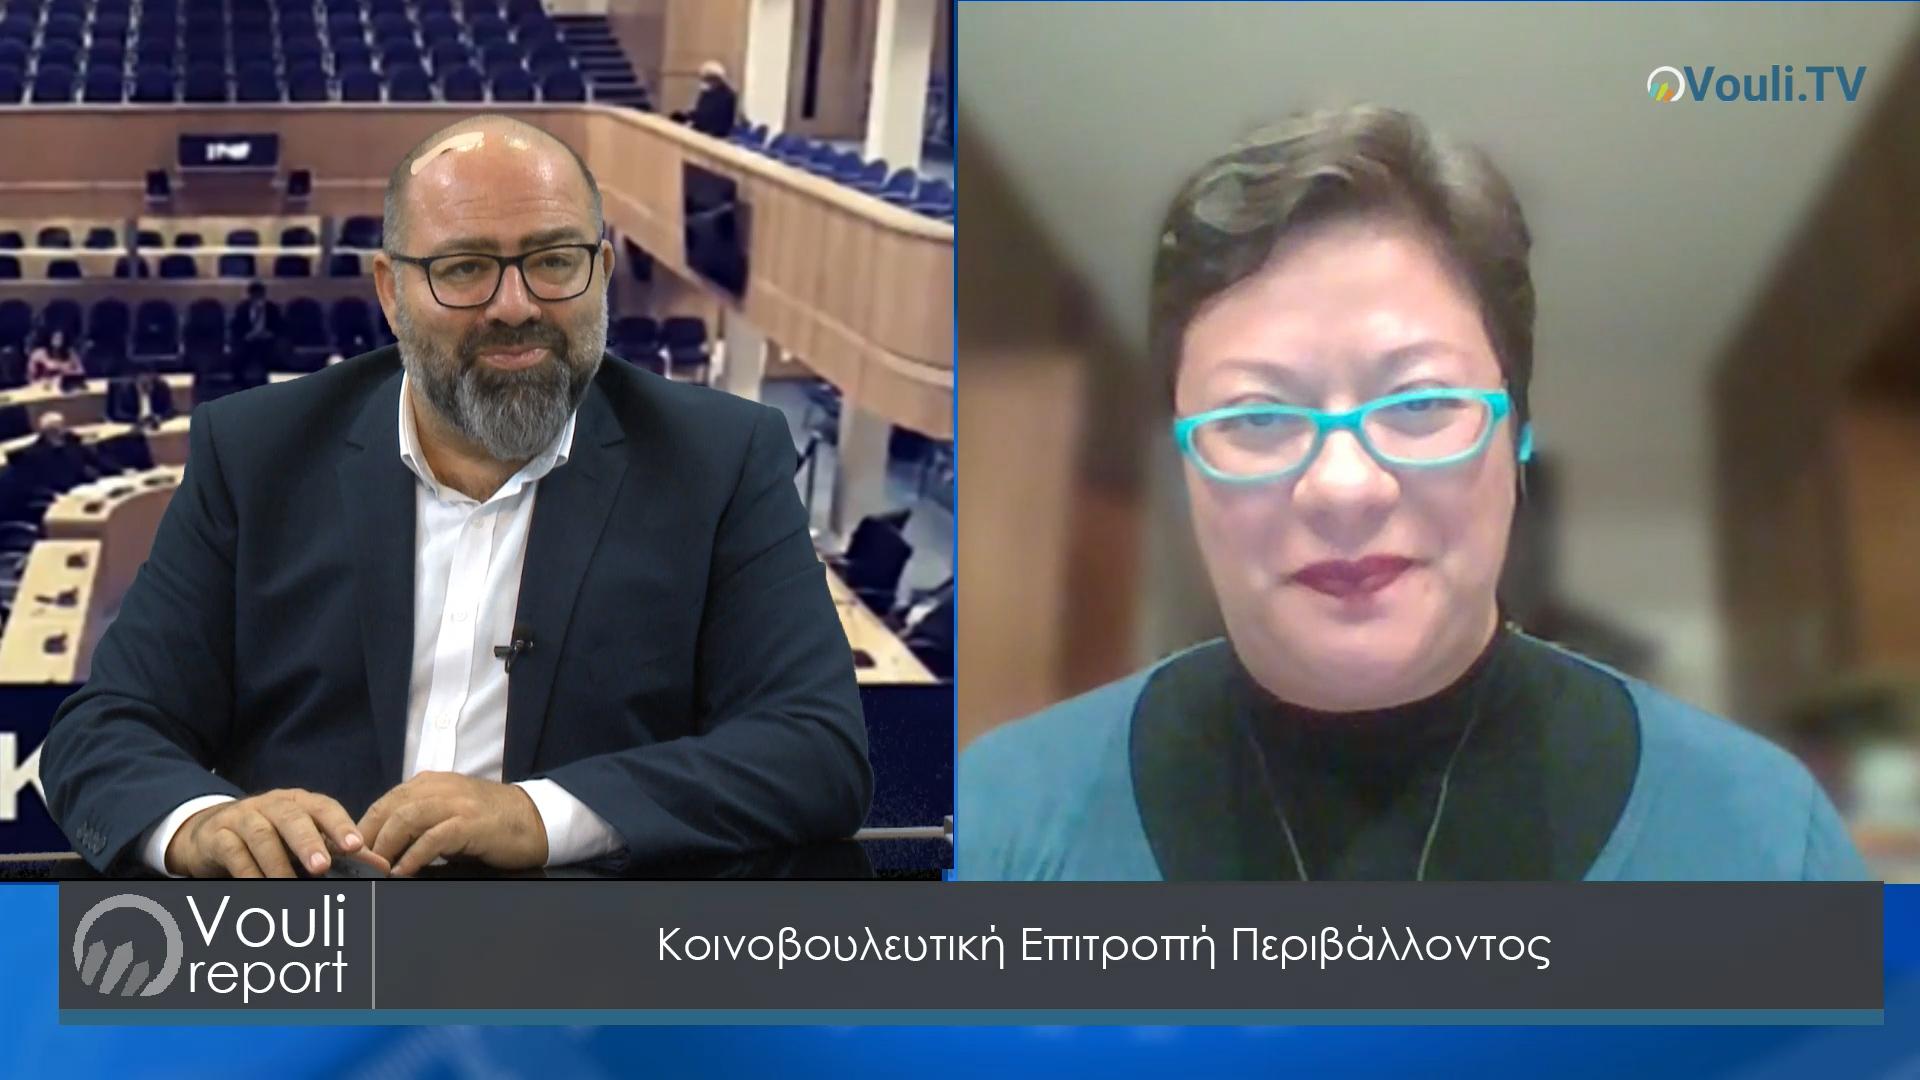 Vouli report - 02/12/2020   Κοινοβουλευτική Επιτροπή Περιβάλλοντος